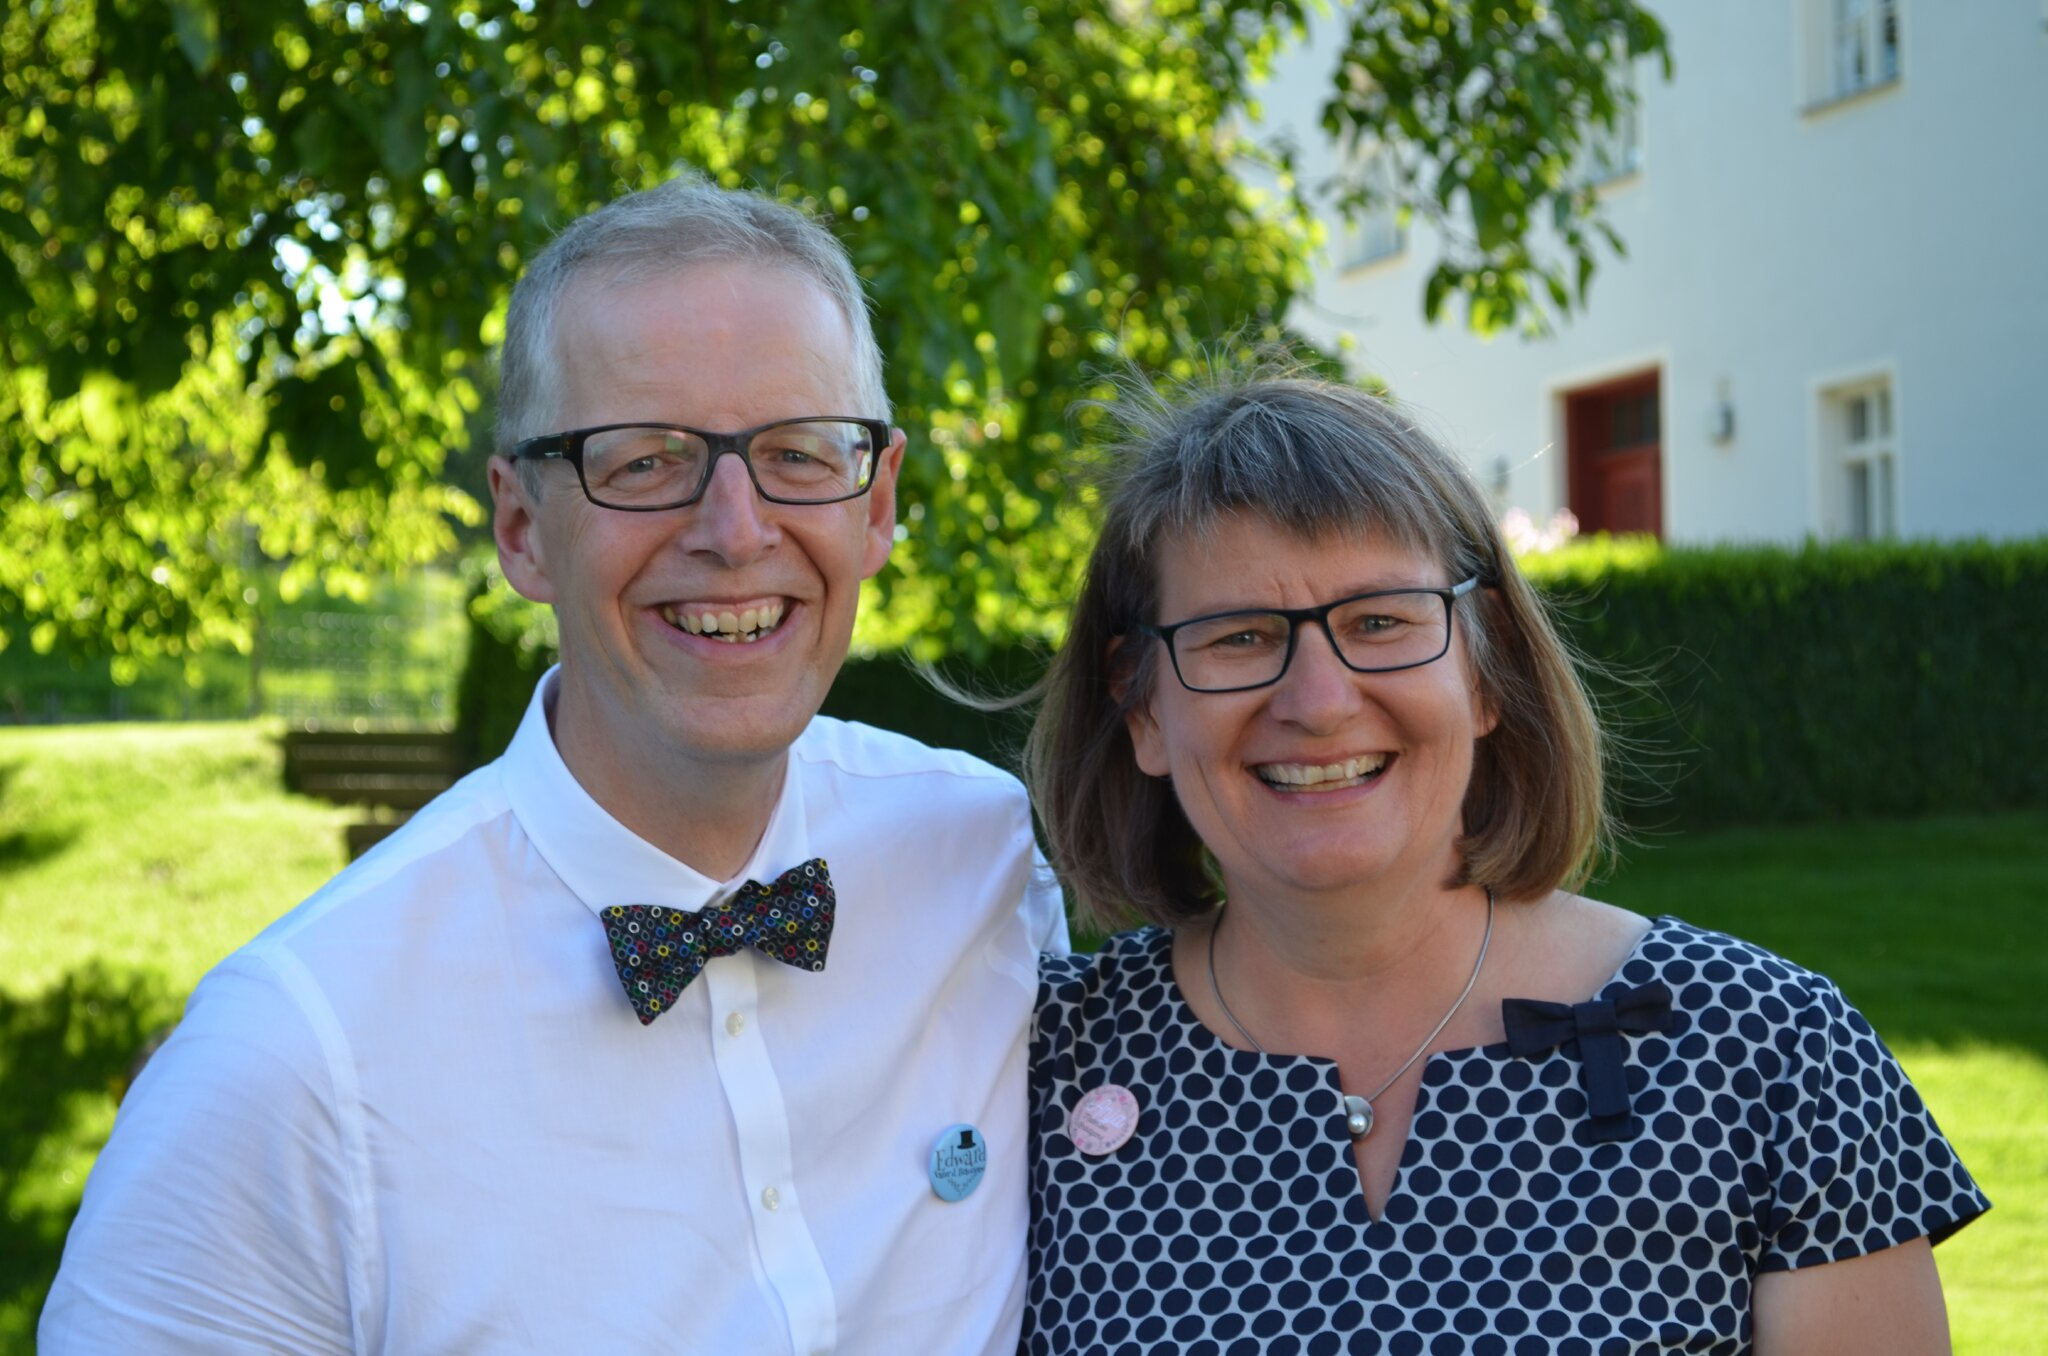 Edward und Anja Morris mit Sweep